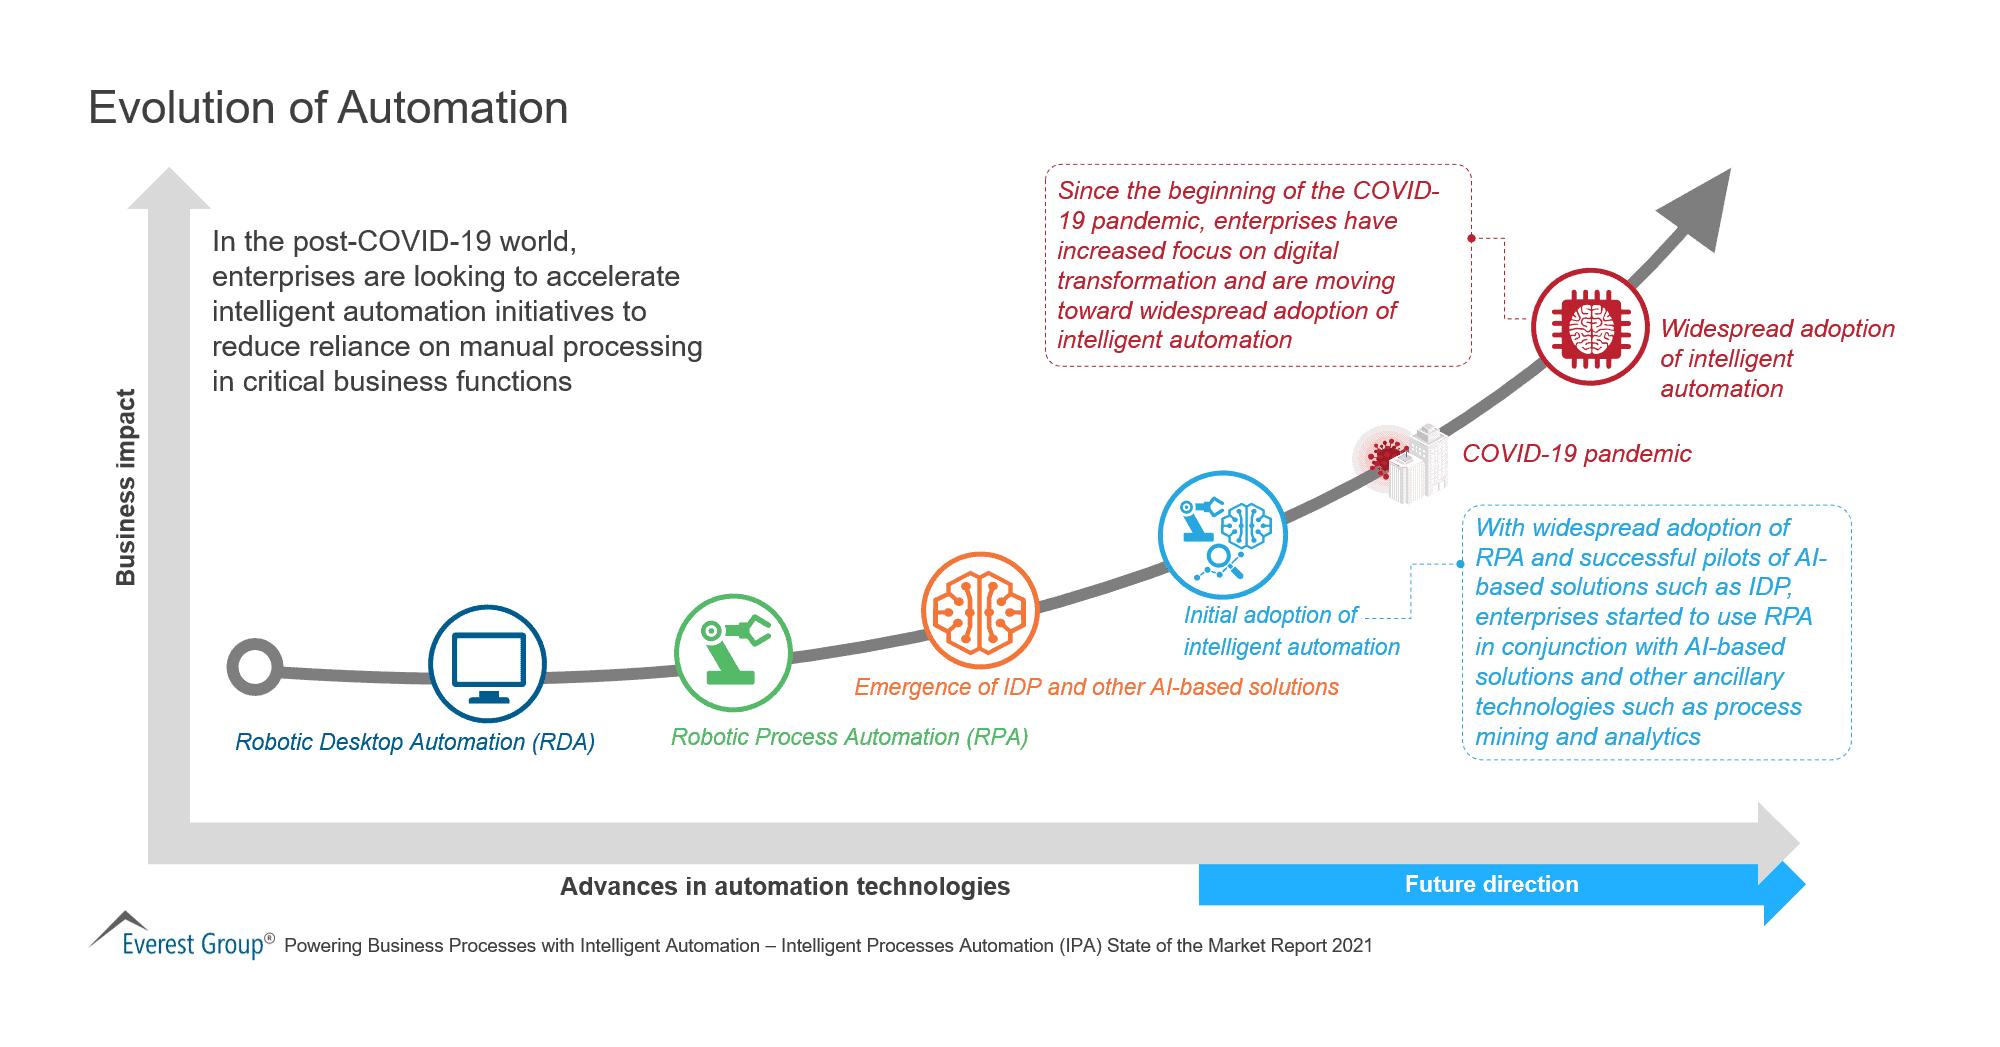 Evolution of Automation